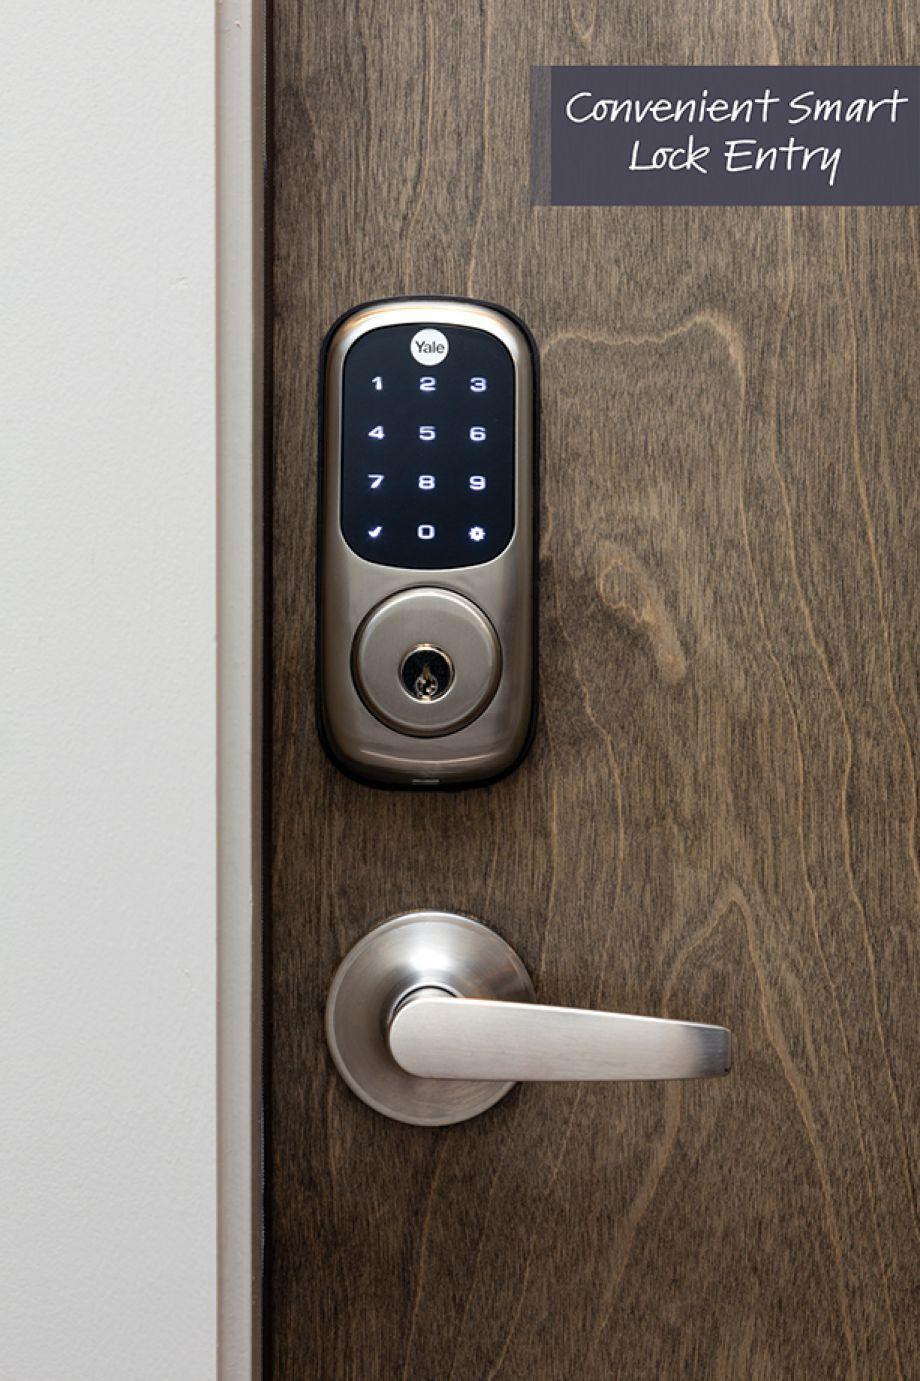 Smart door locks and gates at Camden LaVina Apartments in Orlando, FL